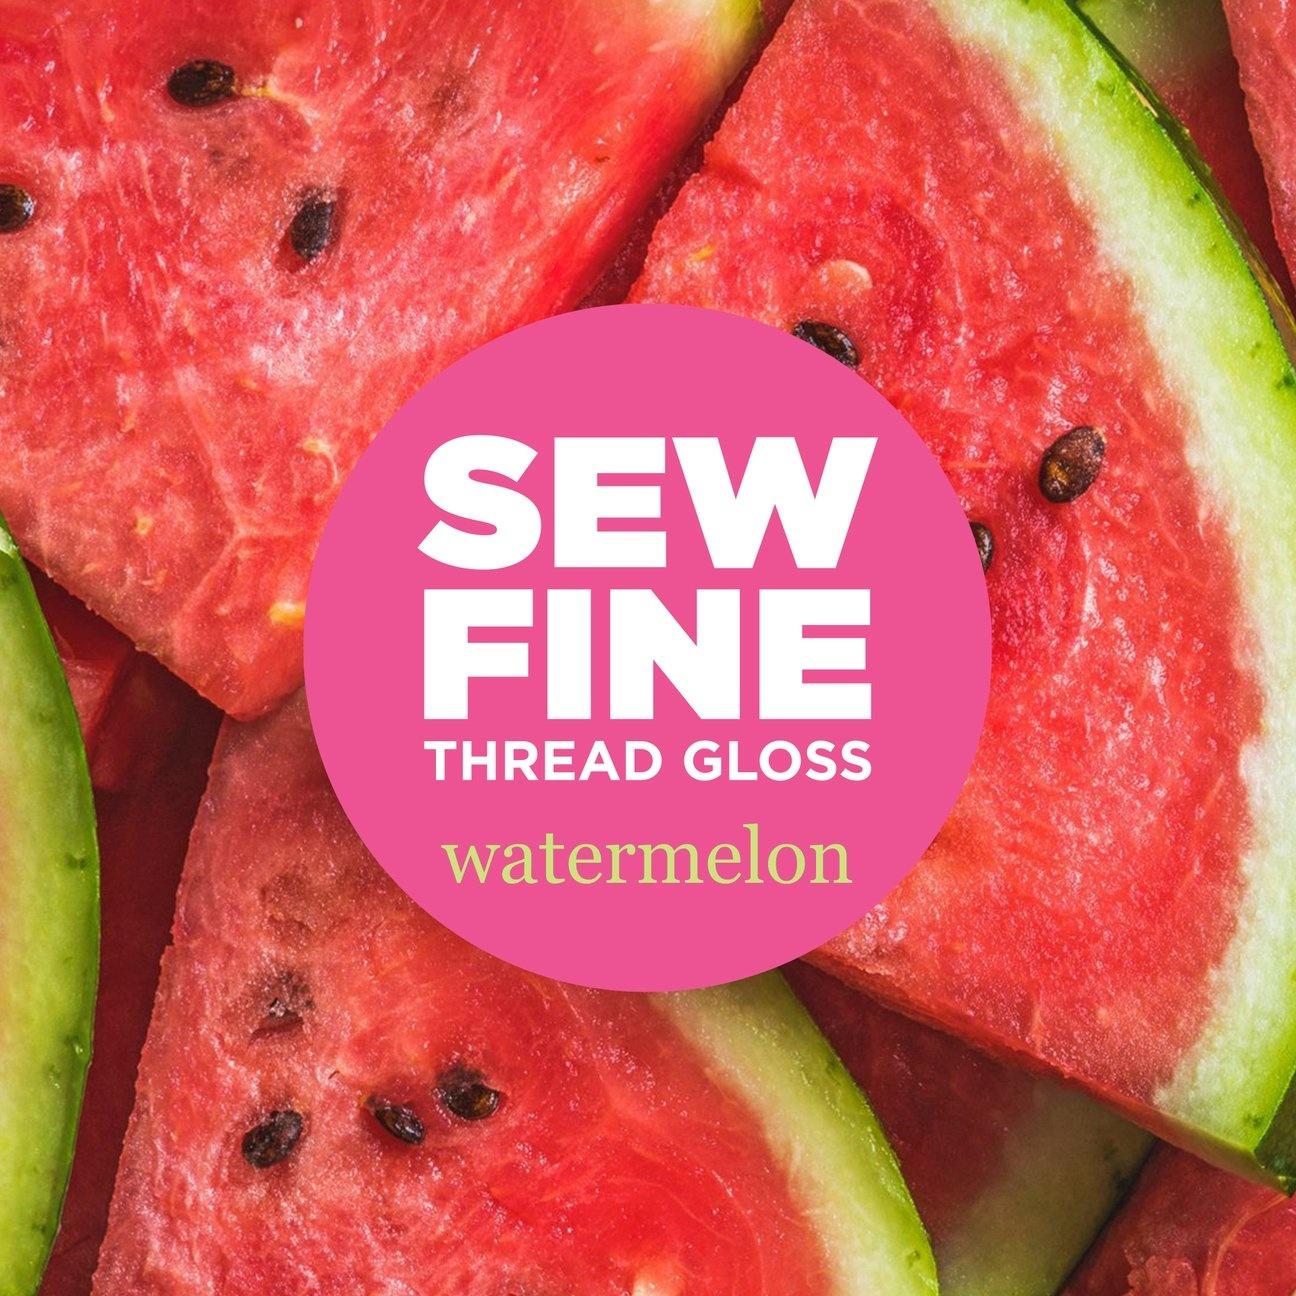 Sew Fine Thread Gloss : Watermelon